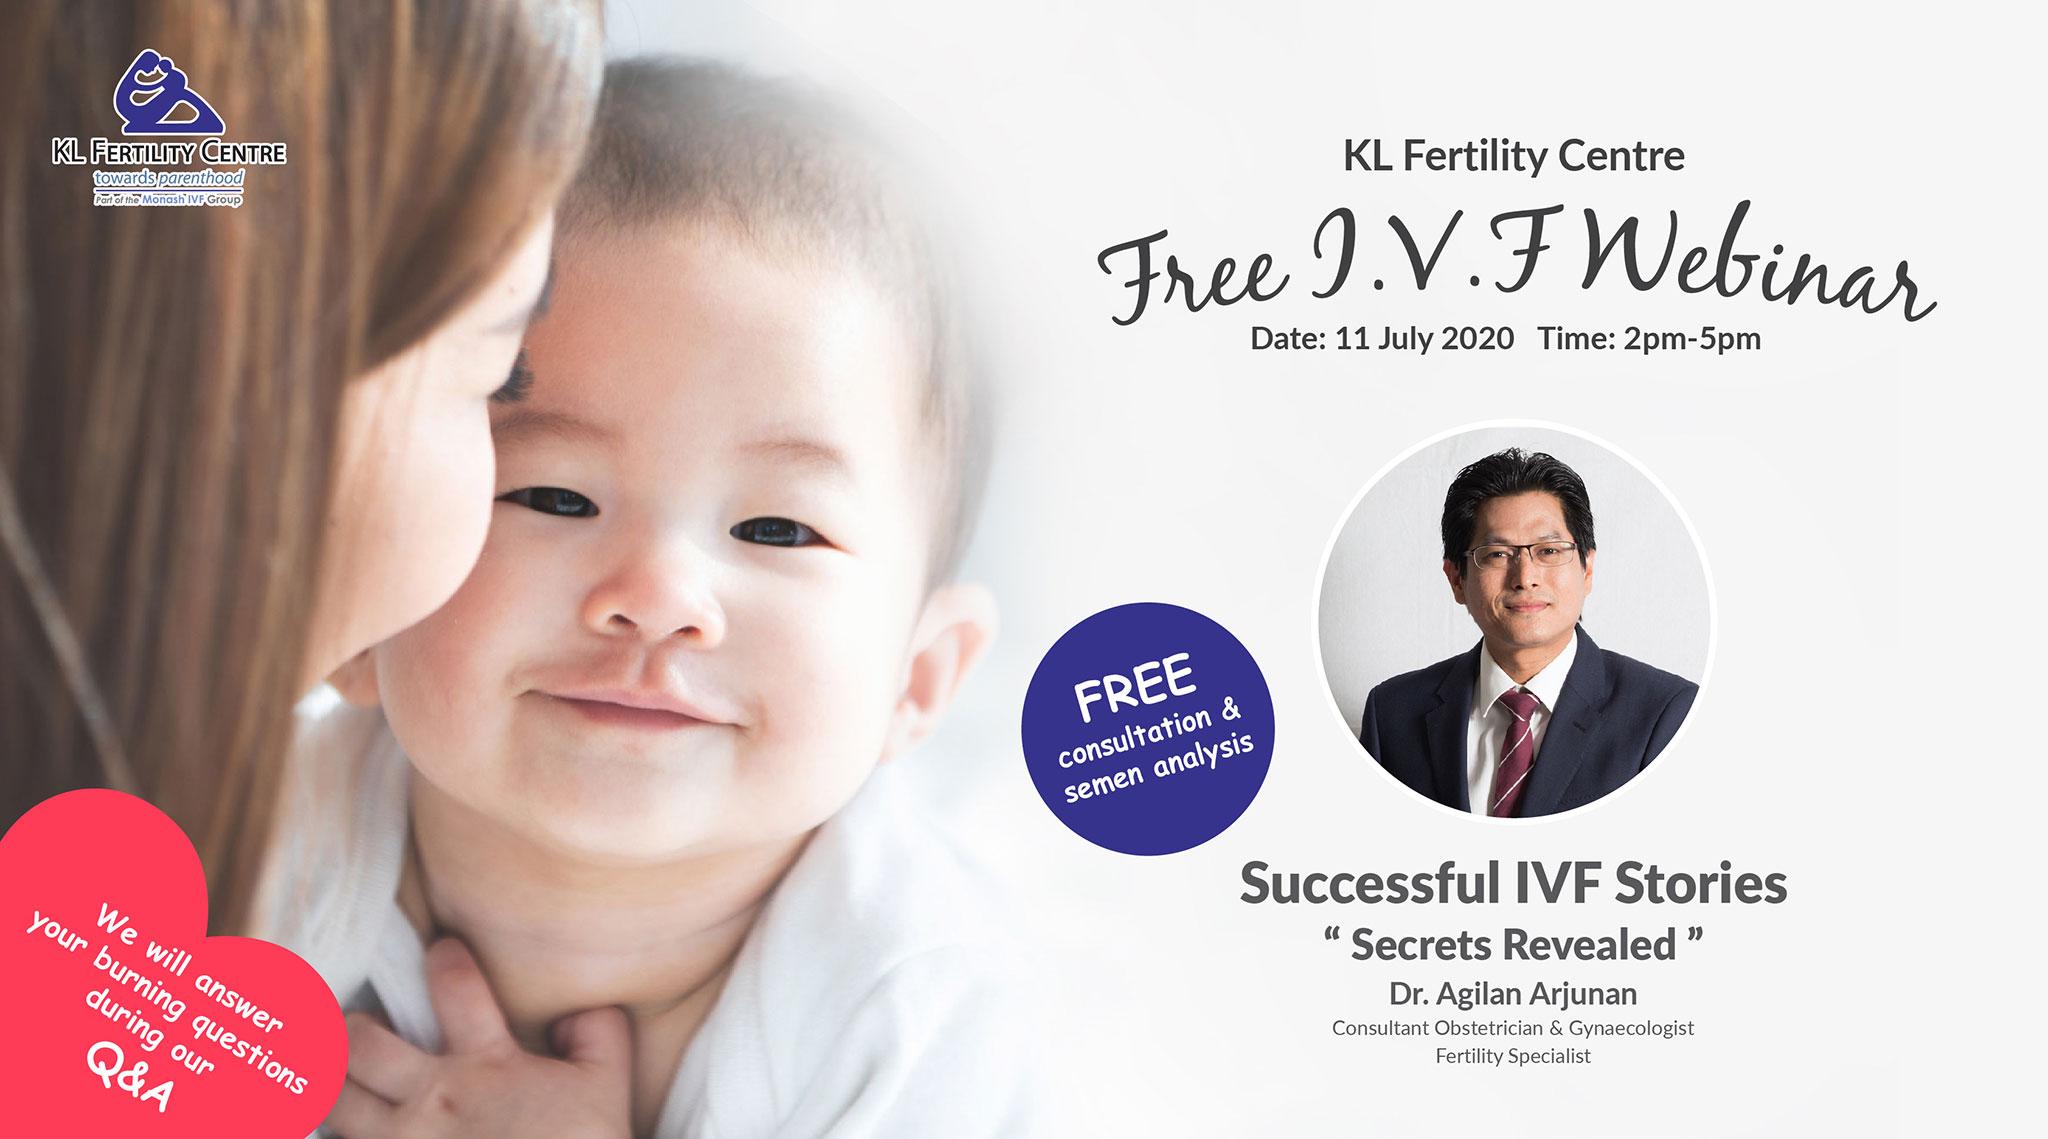 Free IVF Webinar 11 July 2020 - Dr. Agilan Arjunan